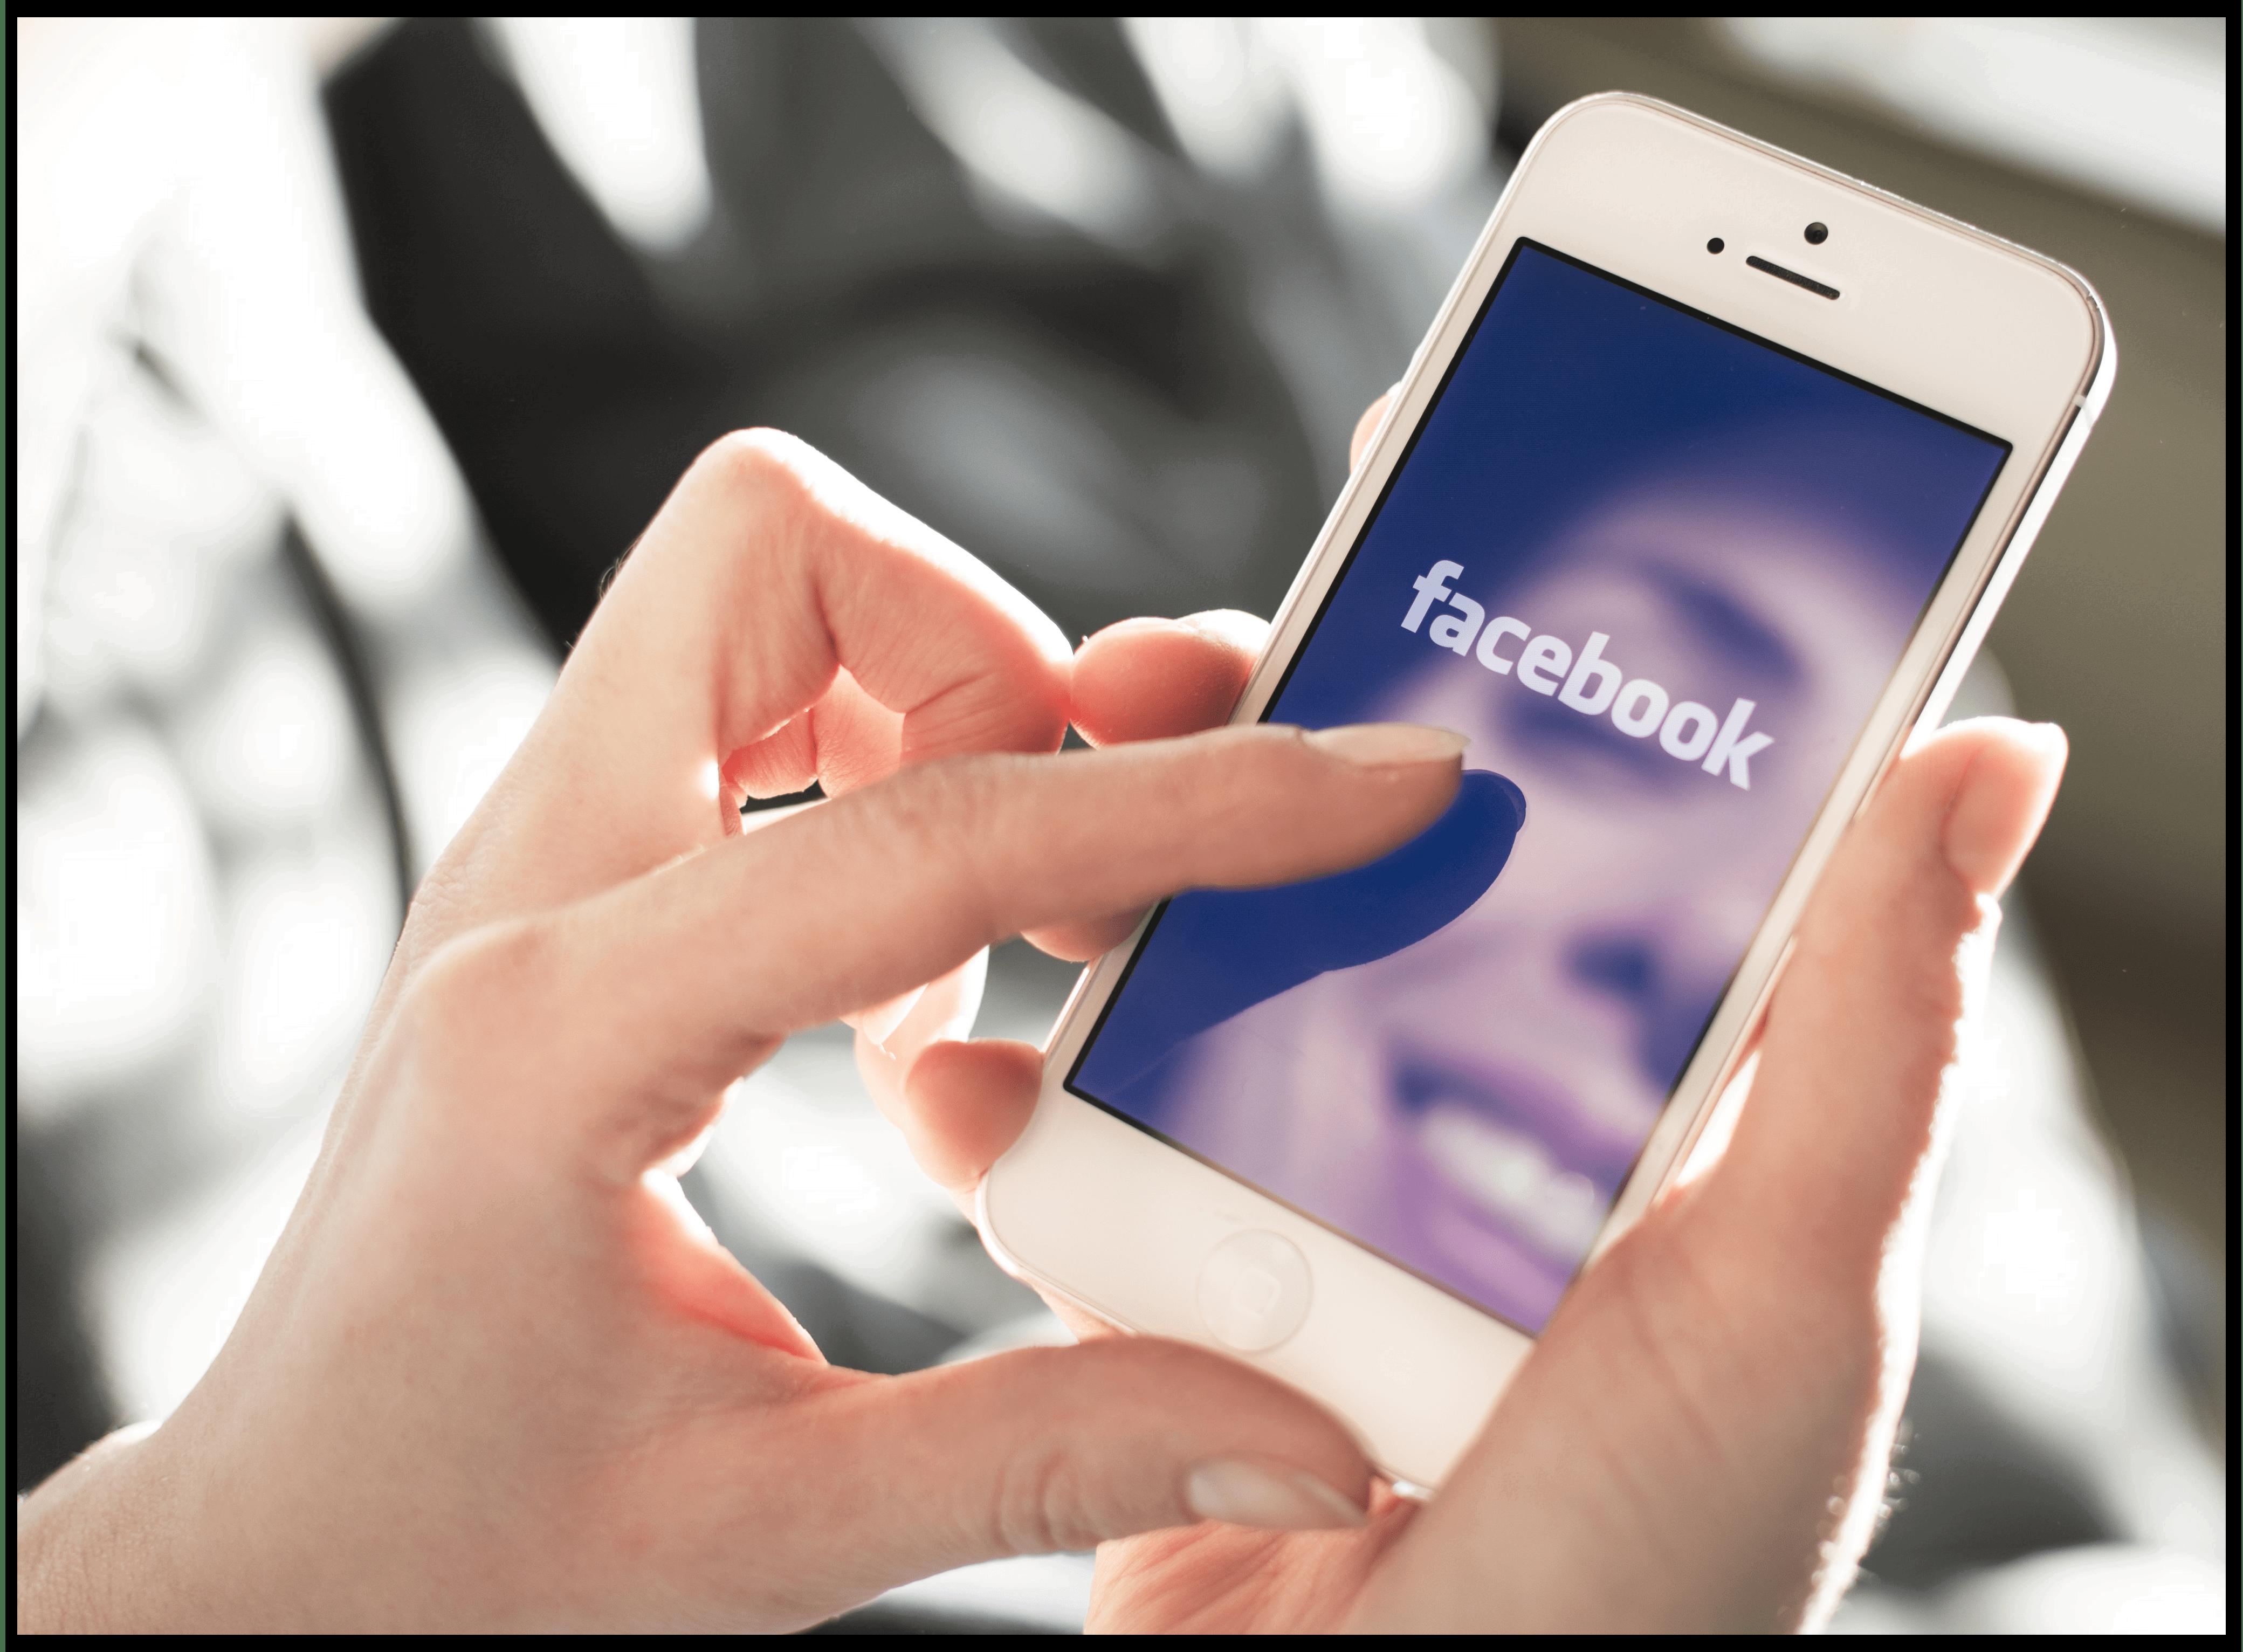 Kartinka-Facebook-dlya-telefona.png